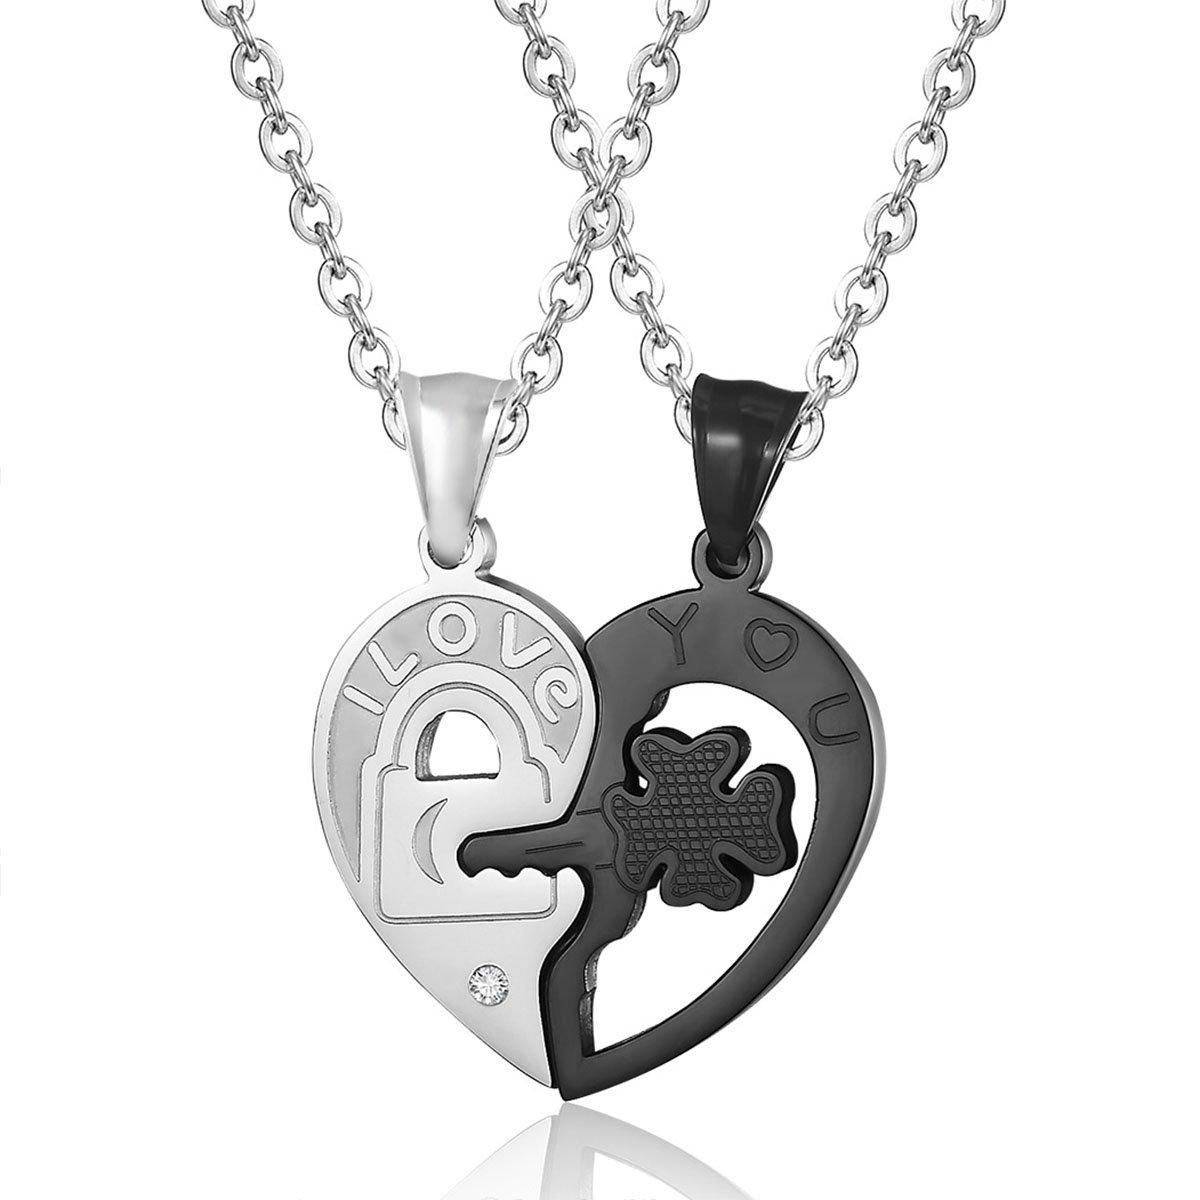 77fd05cc6b Amazon.com: Godyce Couples Necklace Sets Key To My Heart boyfriend and  girlfriend Stainless Steel Pendant Jewelry: Jewelry